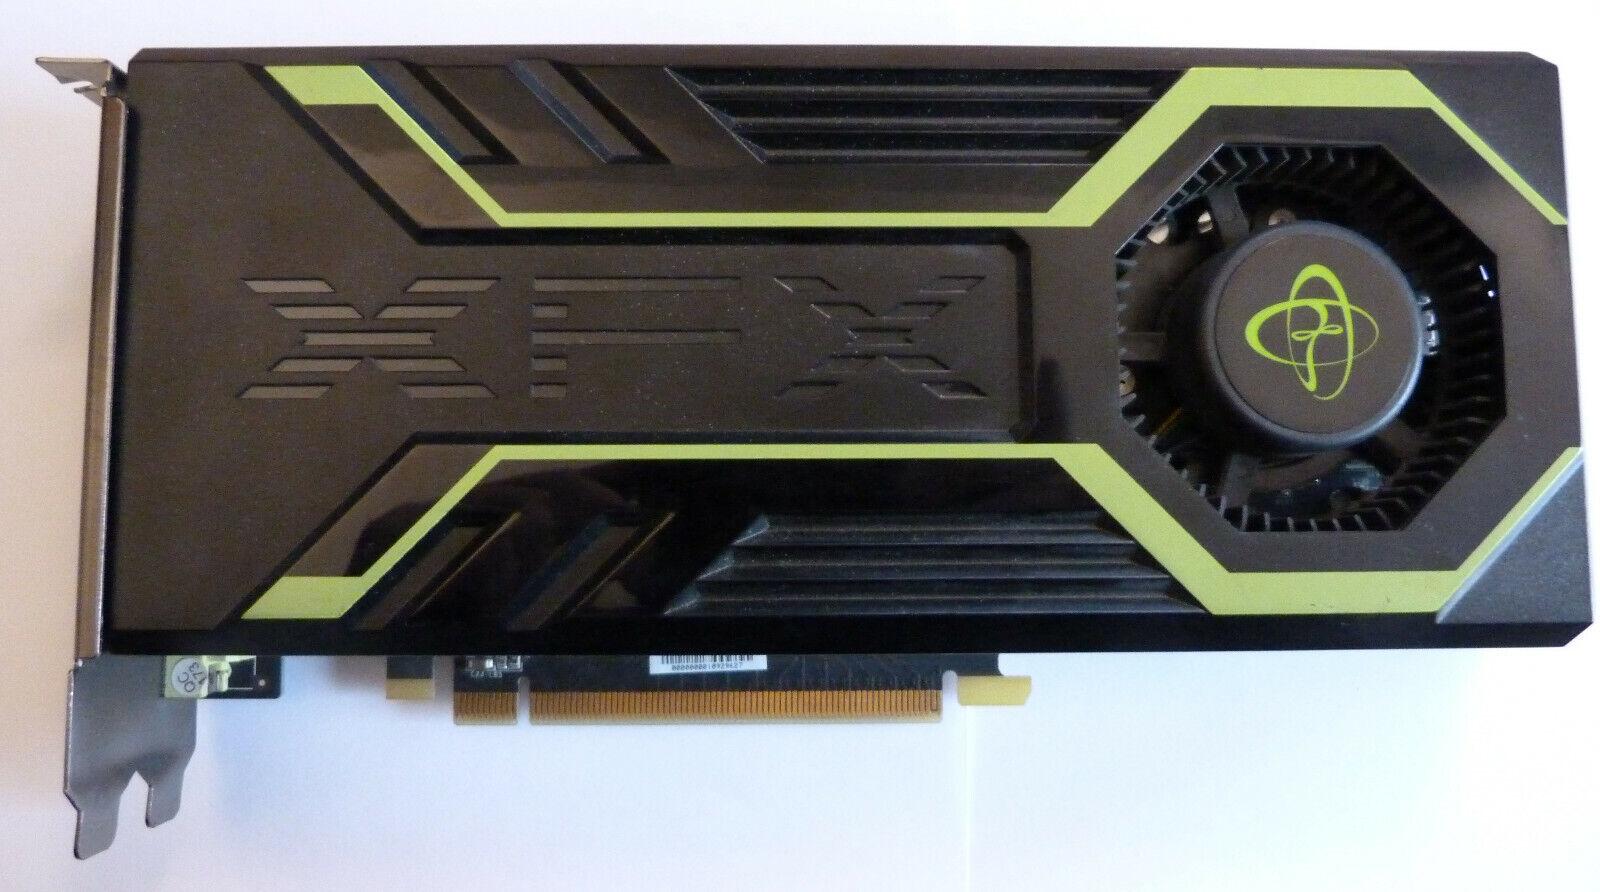 XFX GeForce GTS 250 1GB DDR3 PCI-E Grafikkarte